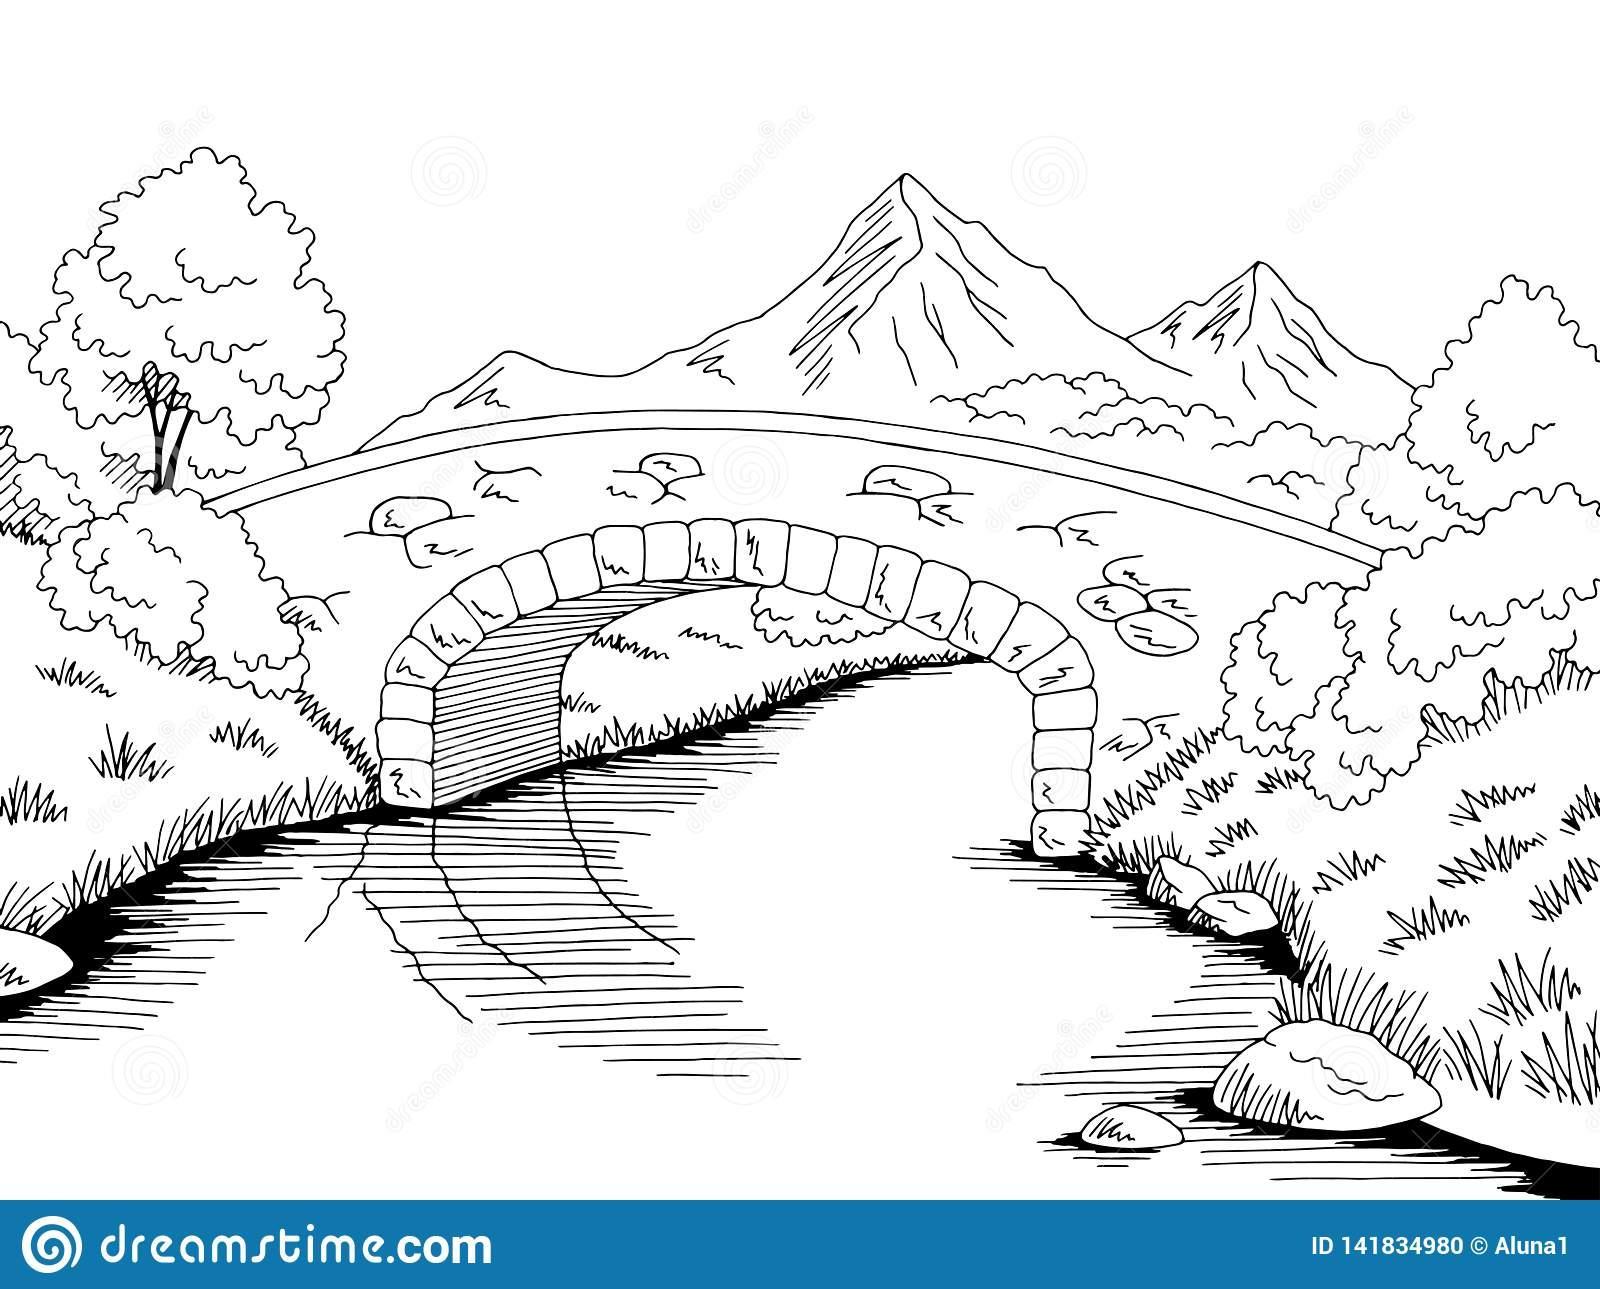 Bridge graphic river black white landscape sketch illustration vector